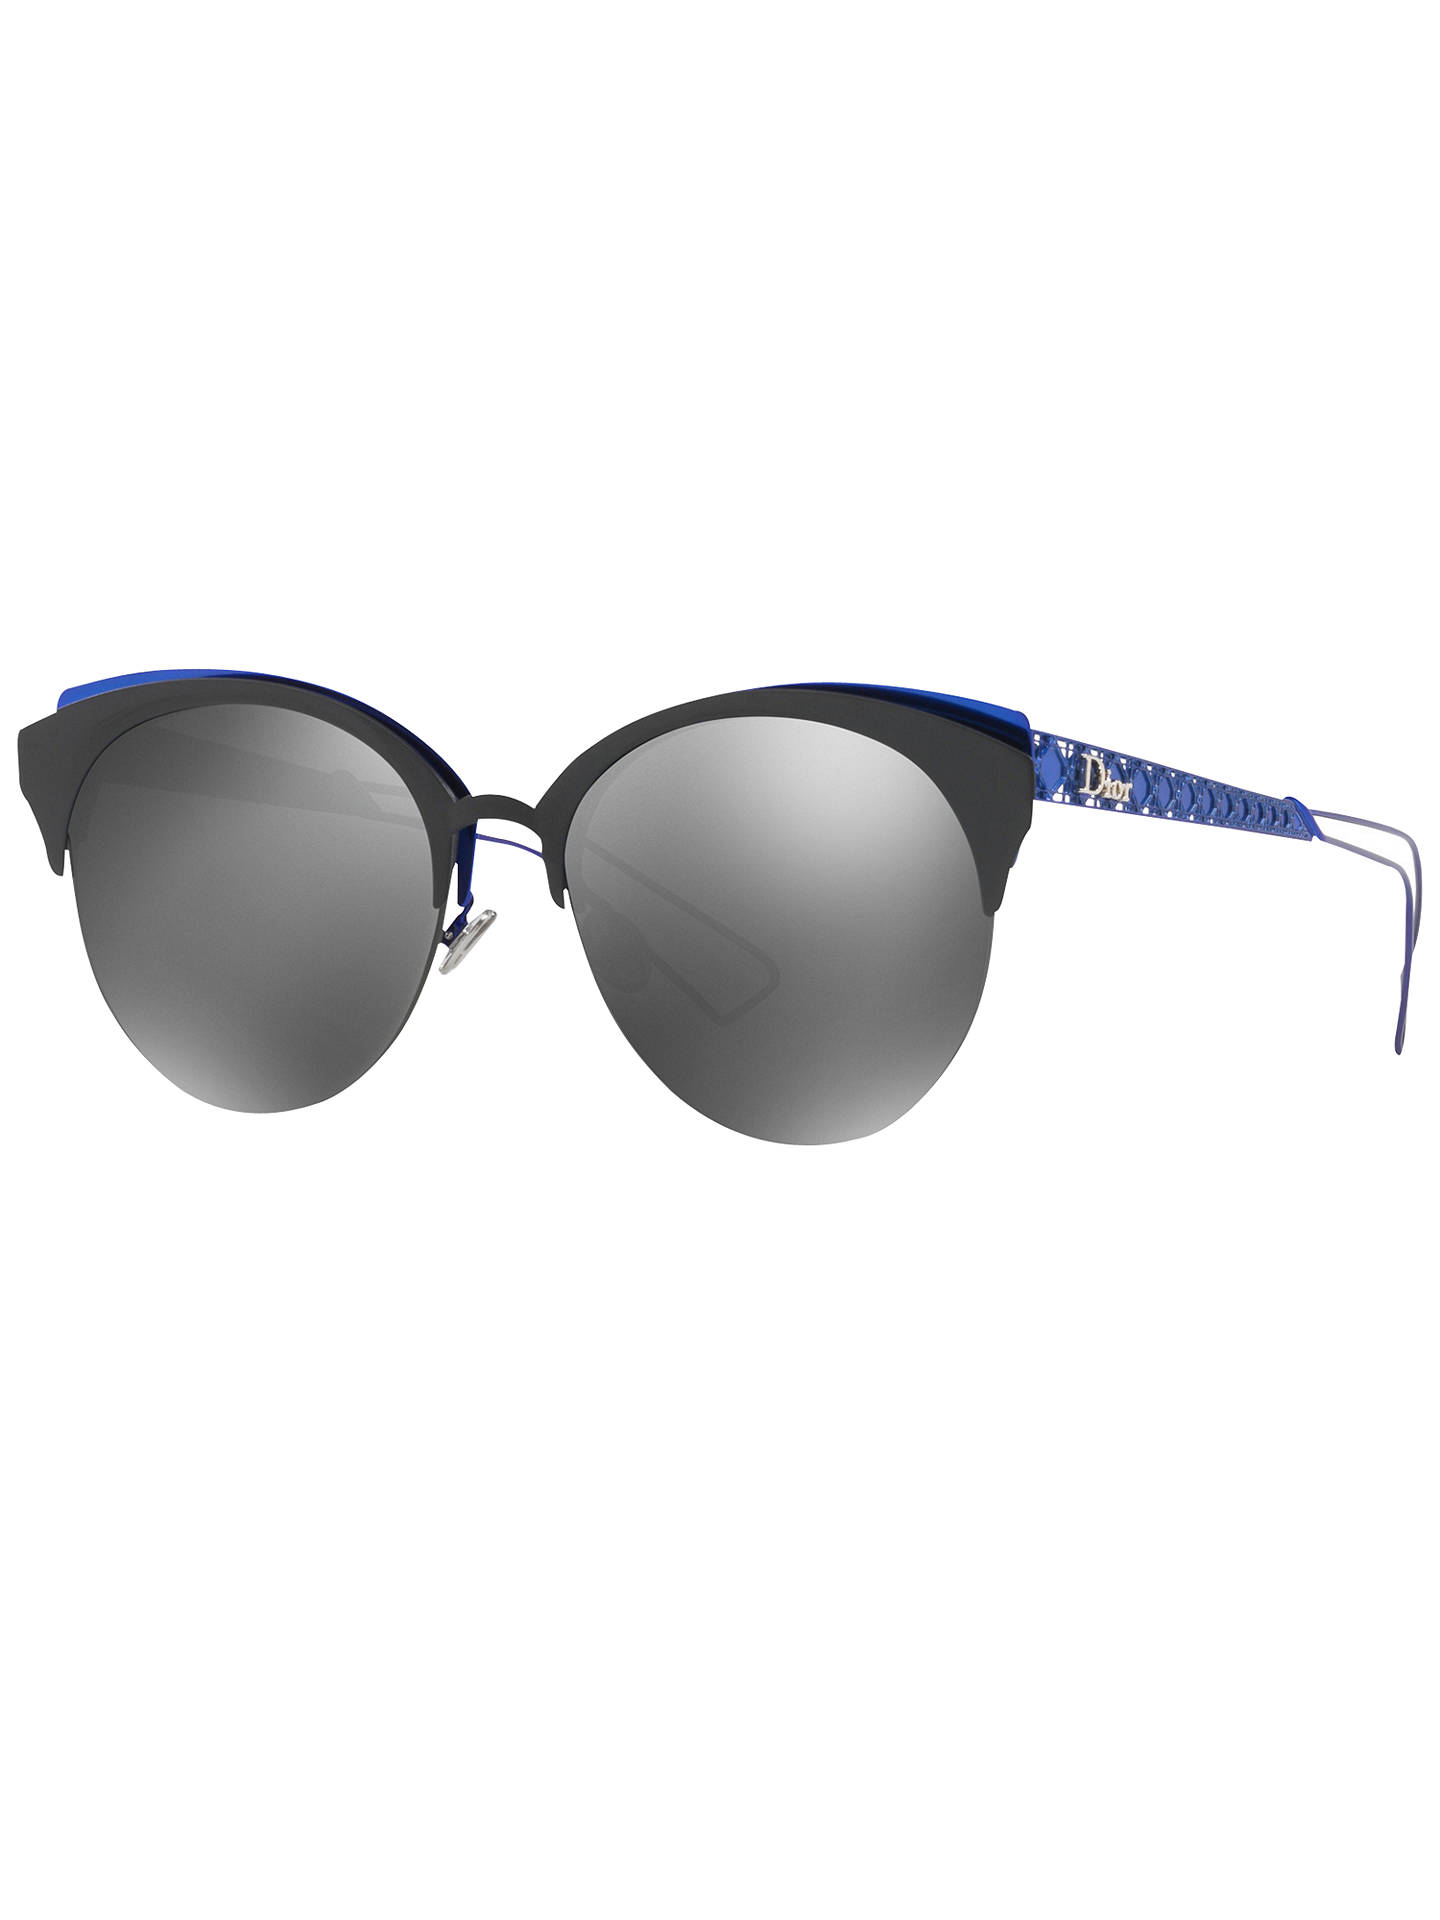 ab432a5b261 Dior Diorama Club Oval Sunglasses at John Lewis   Partners